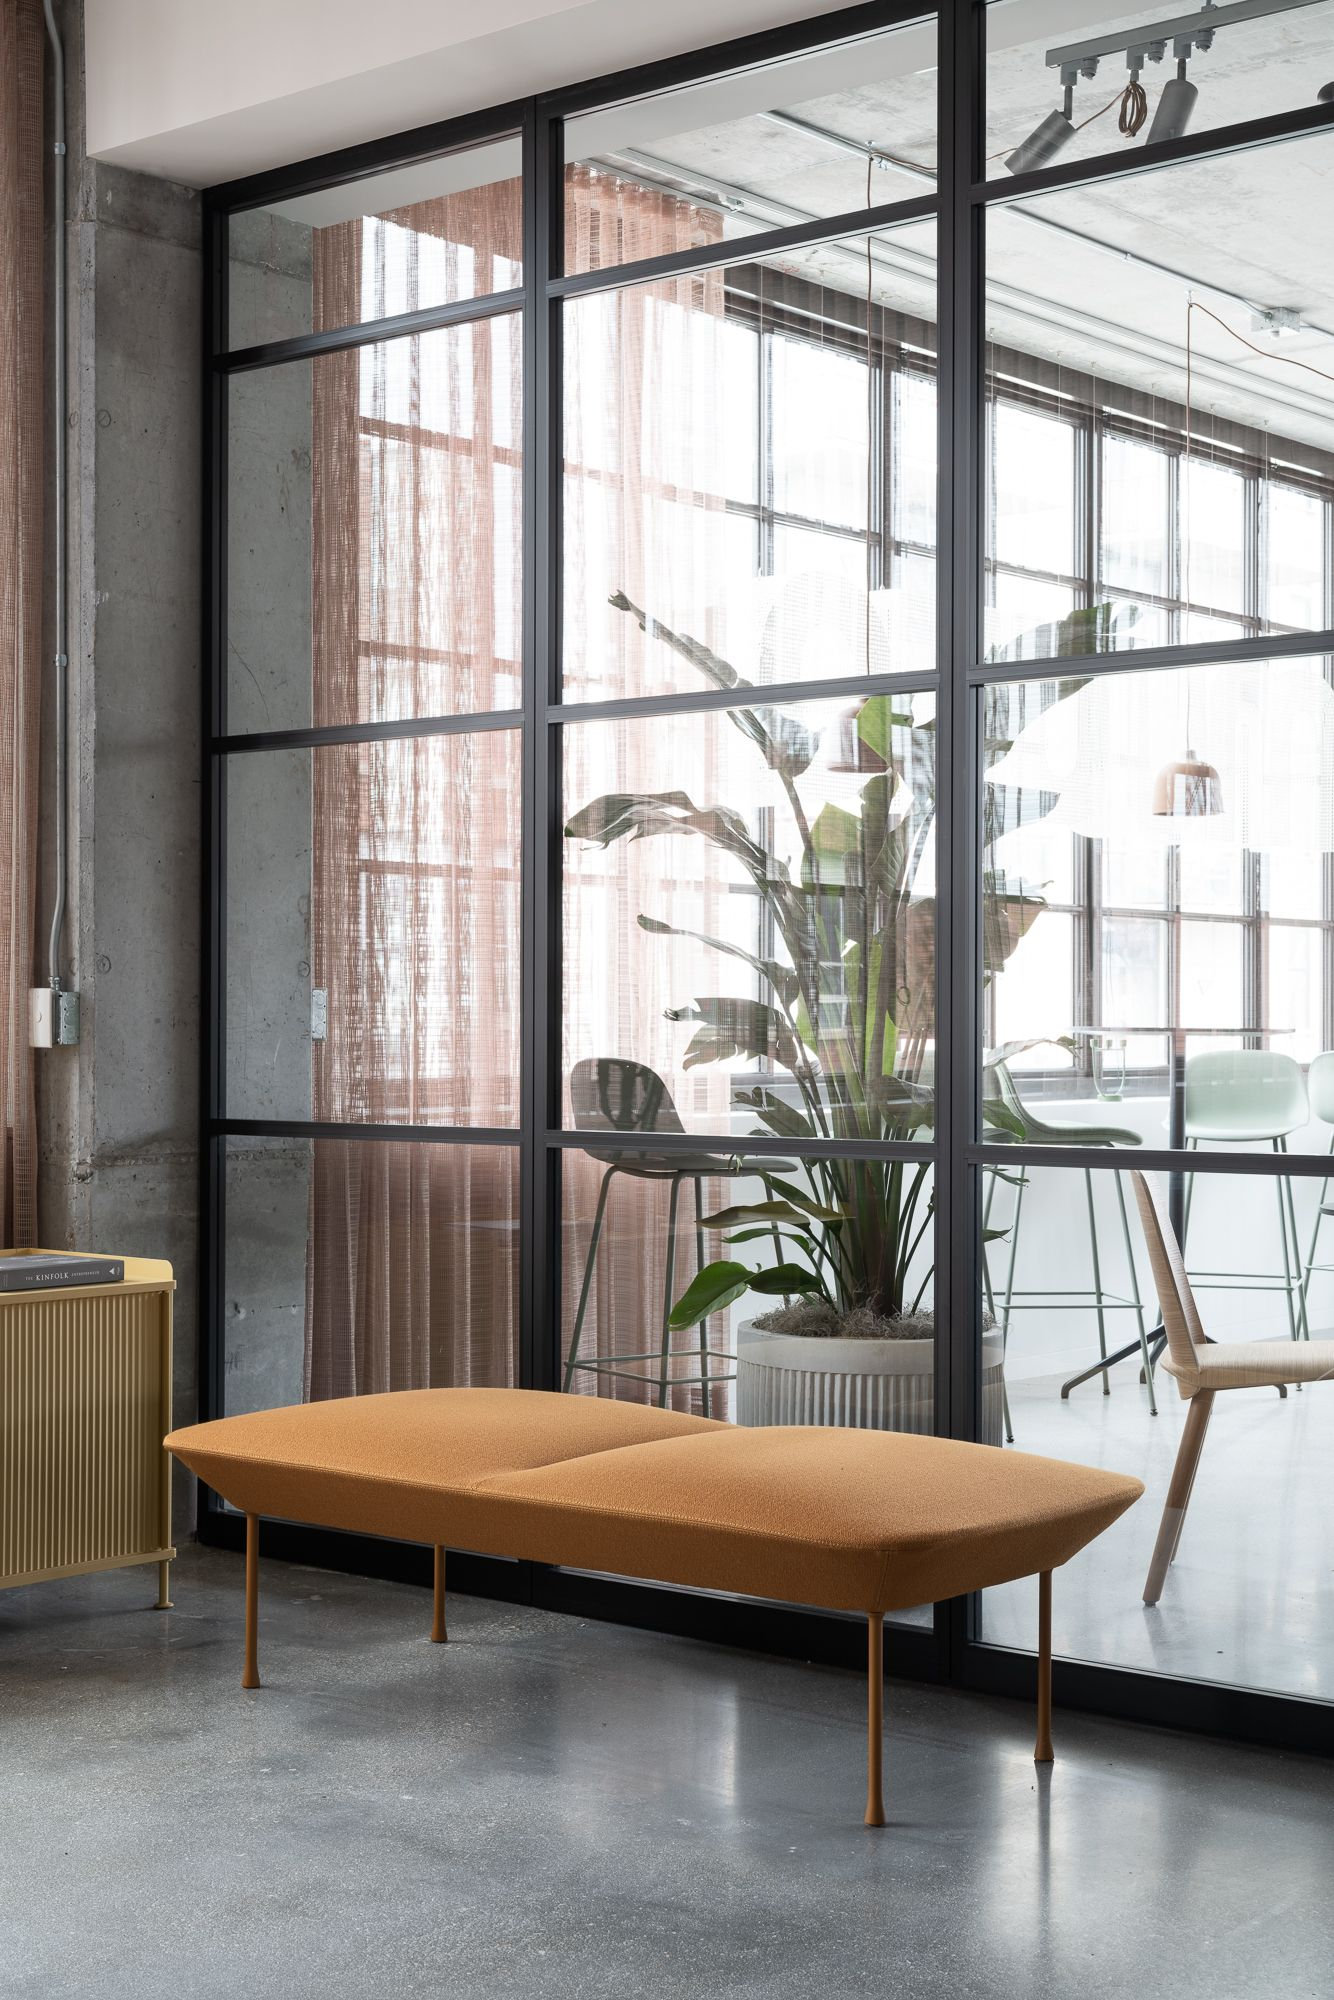 Scandinavian Interior Inspiration From Muuto The Oslo Sofa Family Unites Geometric Line Scandinavian Furniture Design Office Space Decor Furniture Inspiration